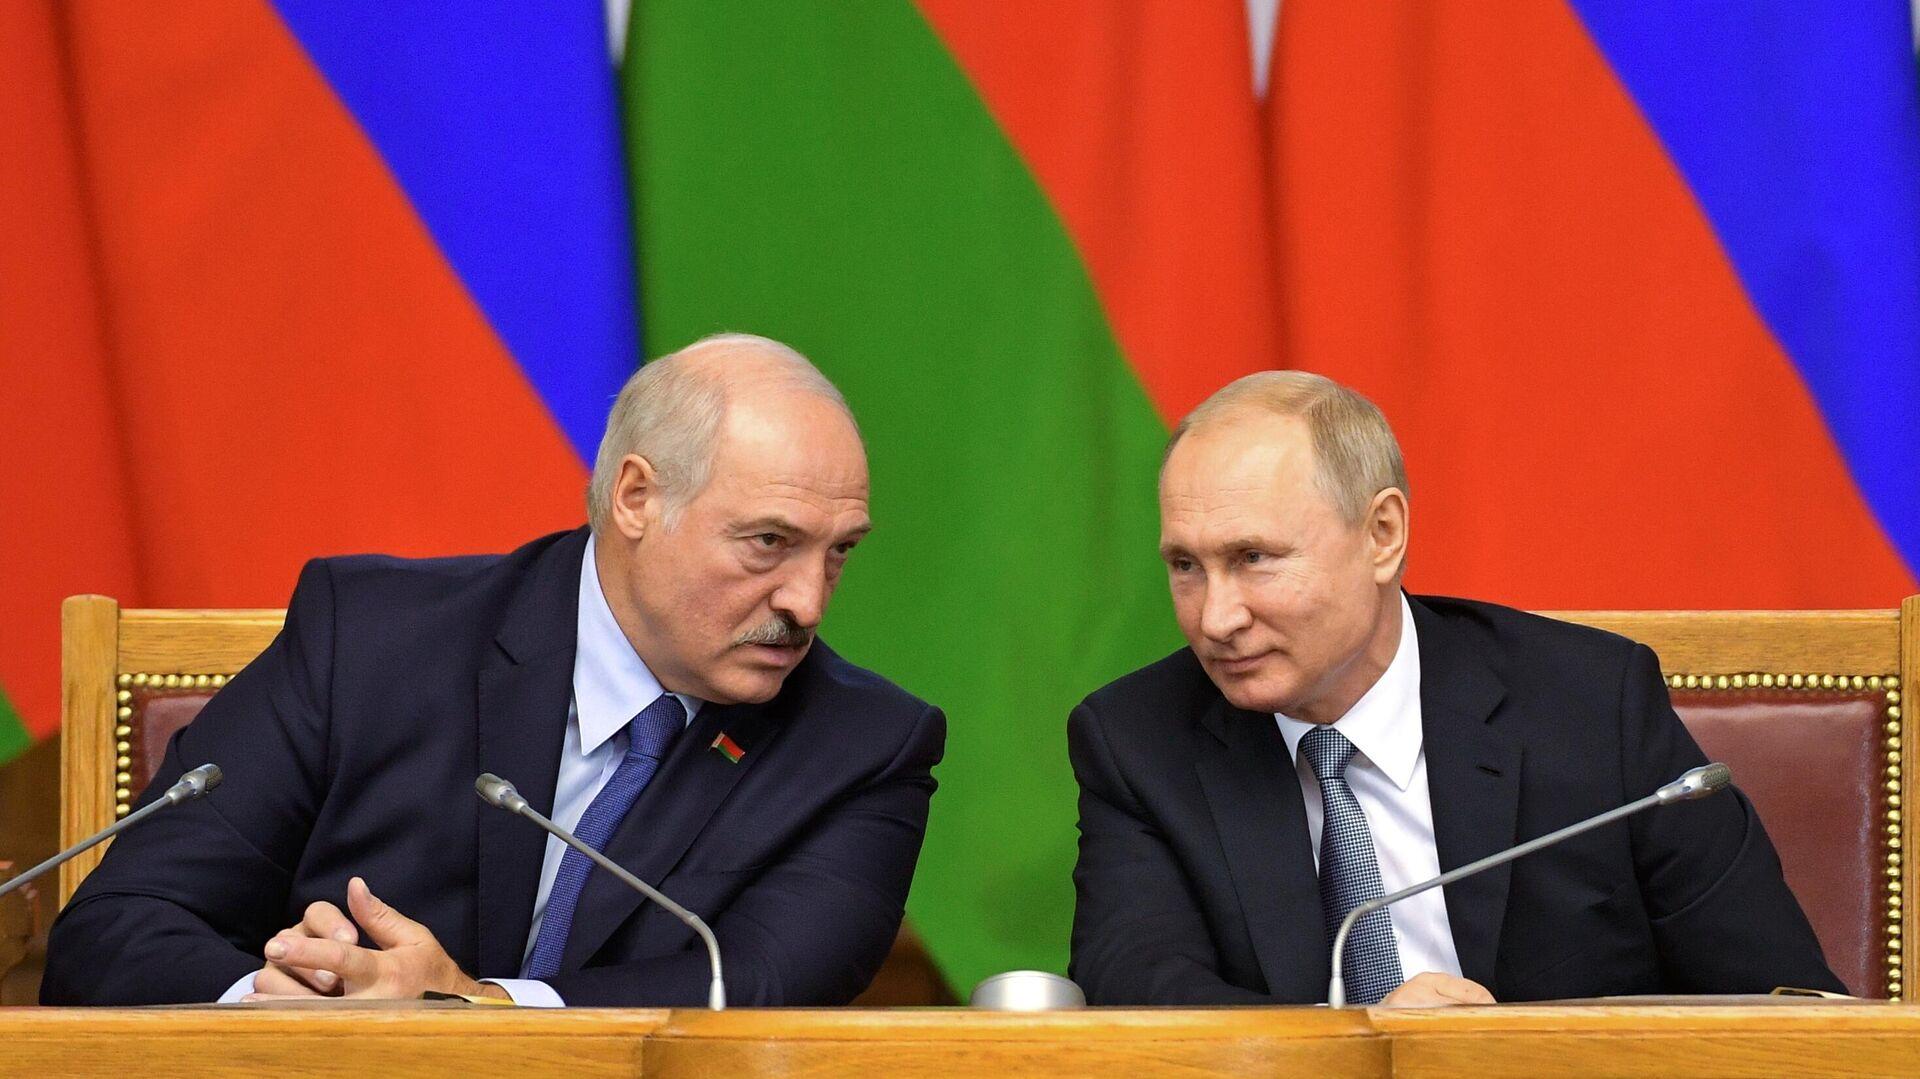 1558745187 0:396:2937:2048 1920x0 80 0 0 4fa201afcbf6bd481195cdd489881e76 - Путин и Лукашенко обсудили ситуацию в Карабахе и Киргизии